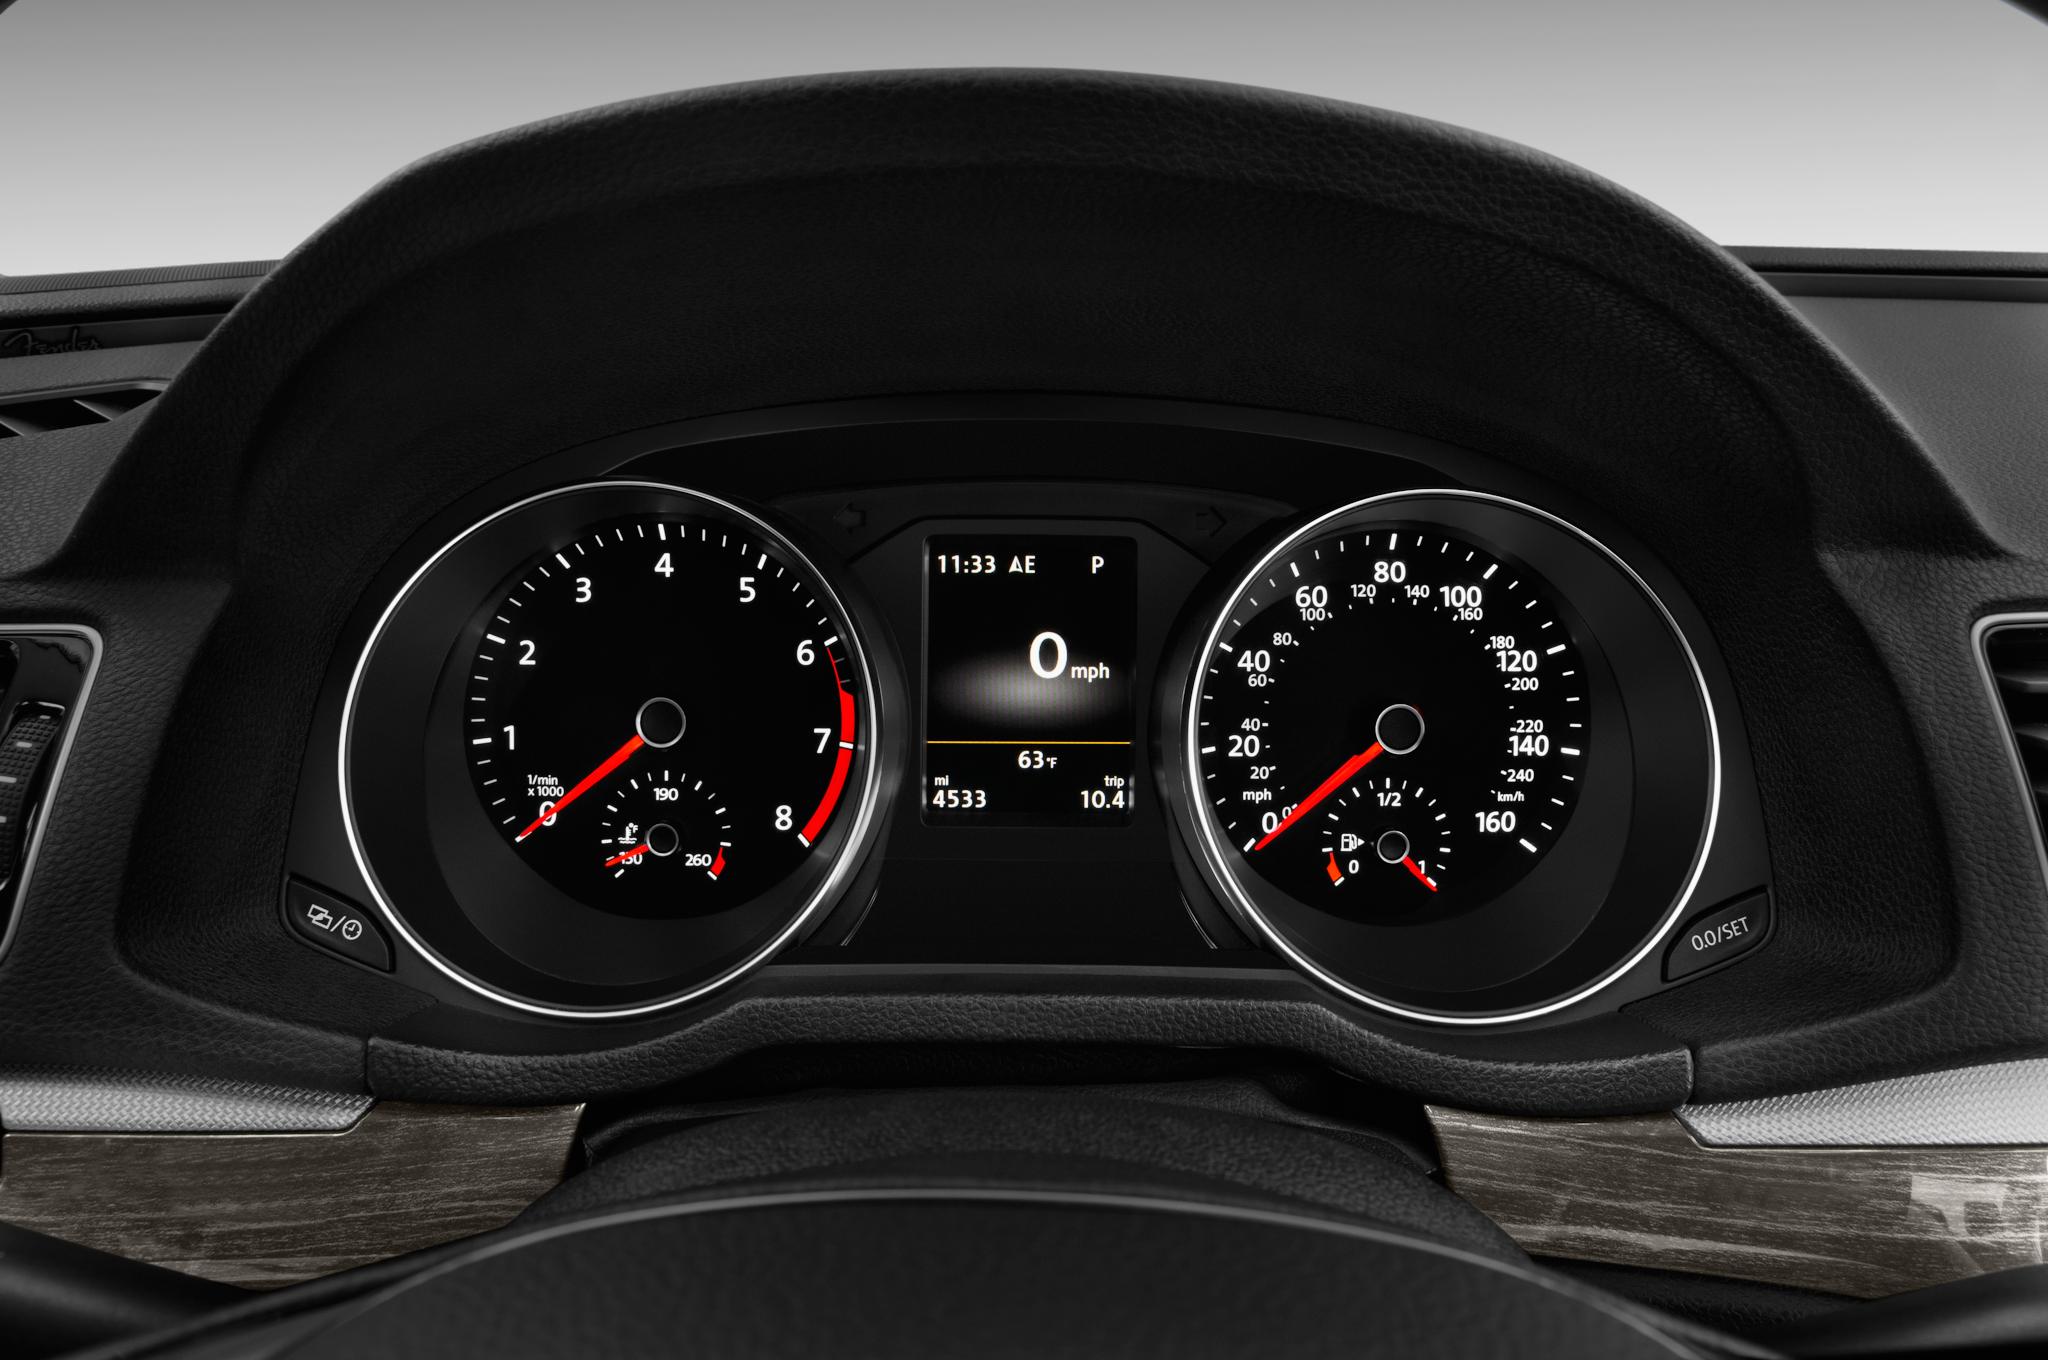 volkswagen passat 2014 dashboard